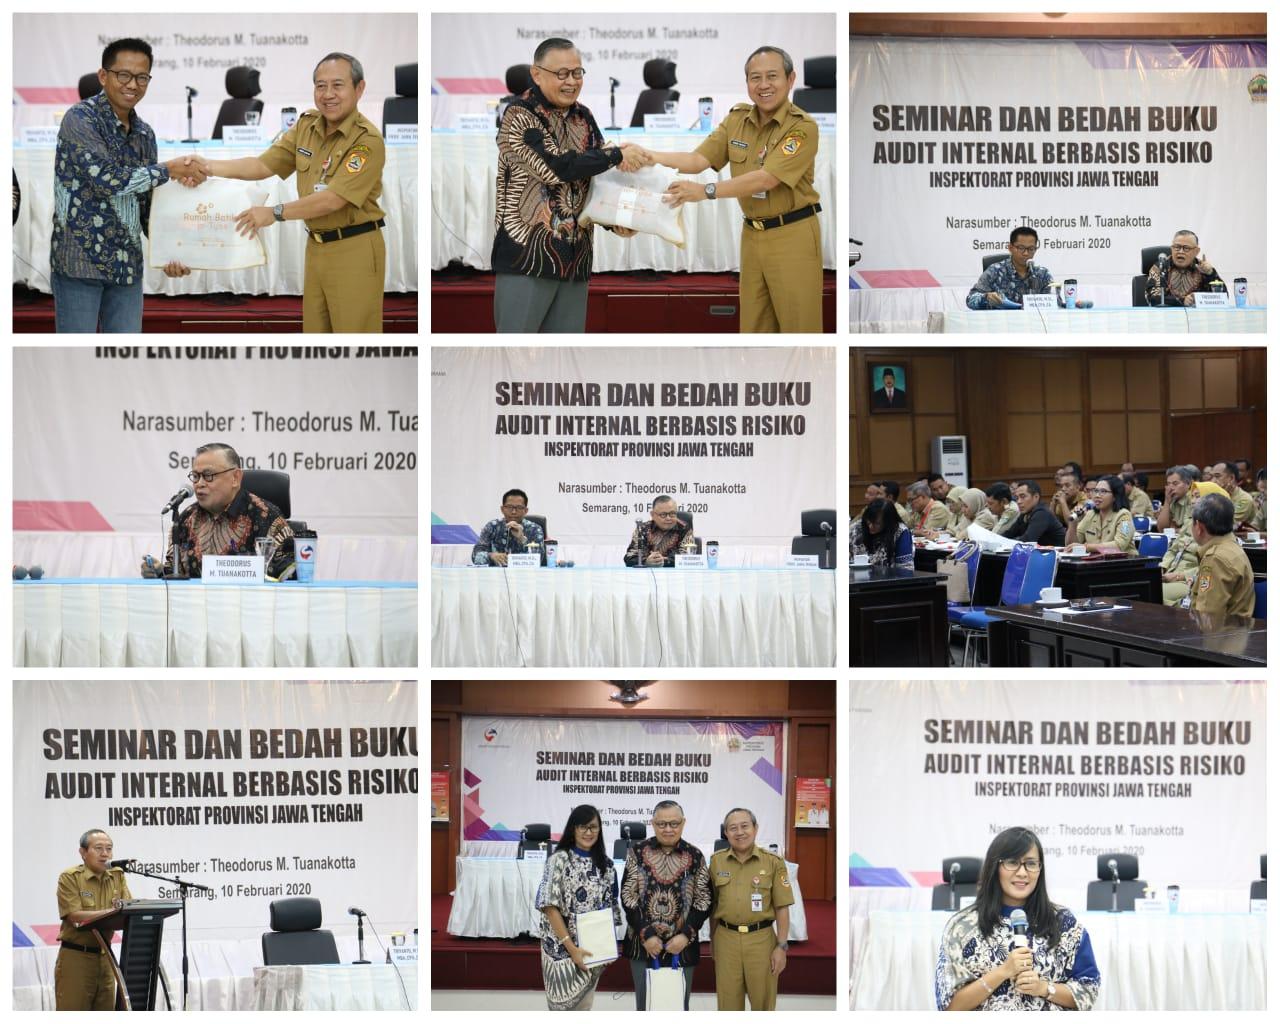 Bedah Buku dan Seminar Audit Internal berbasis Risiko INSPEKTORAT PROVINSI JAWA TENGAH